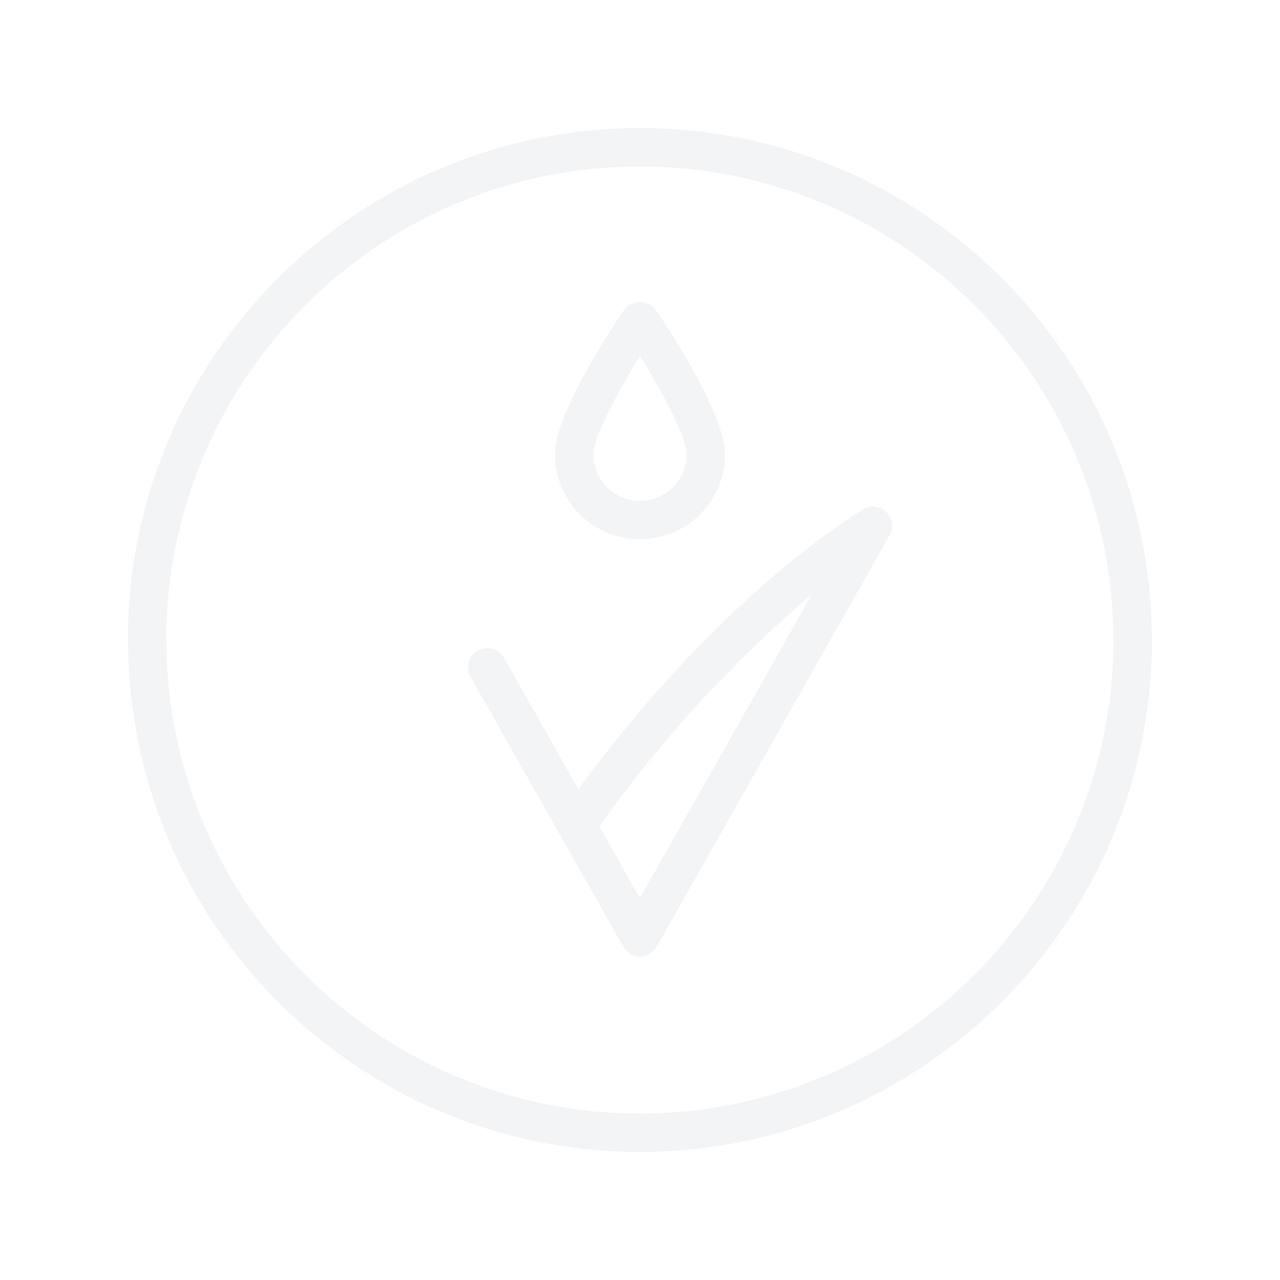 MISSHA All Around Safe Block Aqua Sun Gel SPF50 50ml